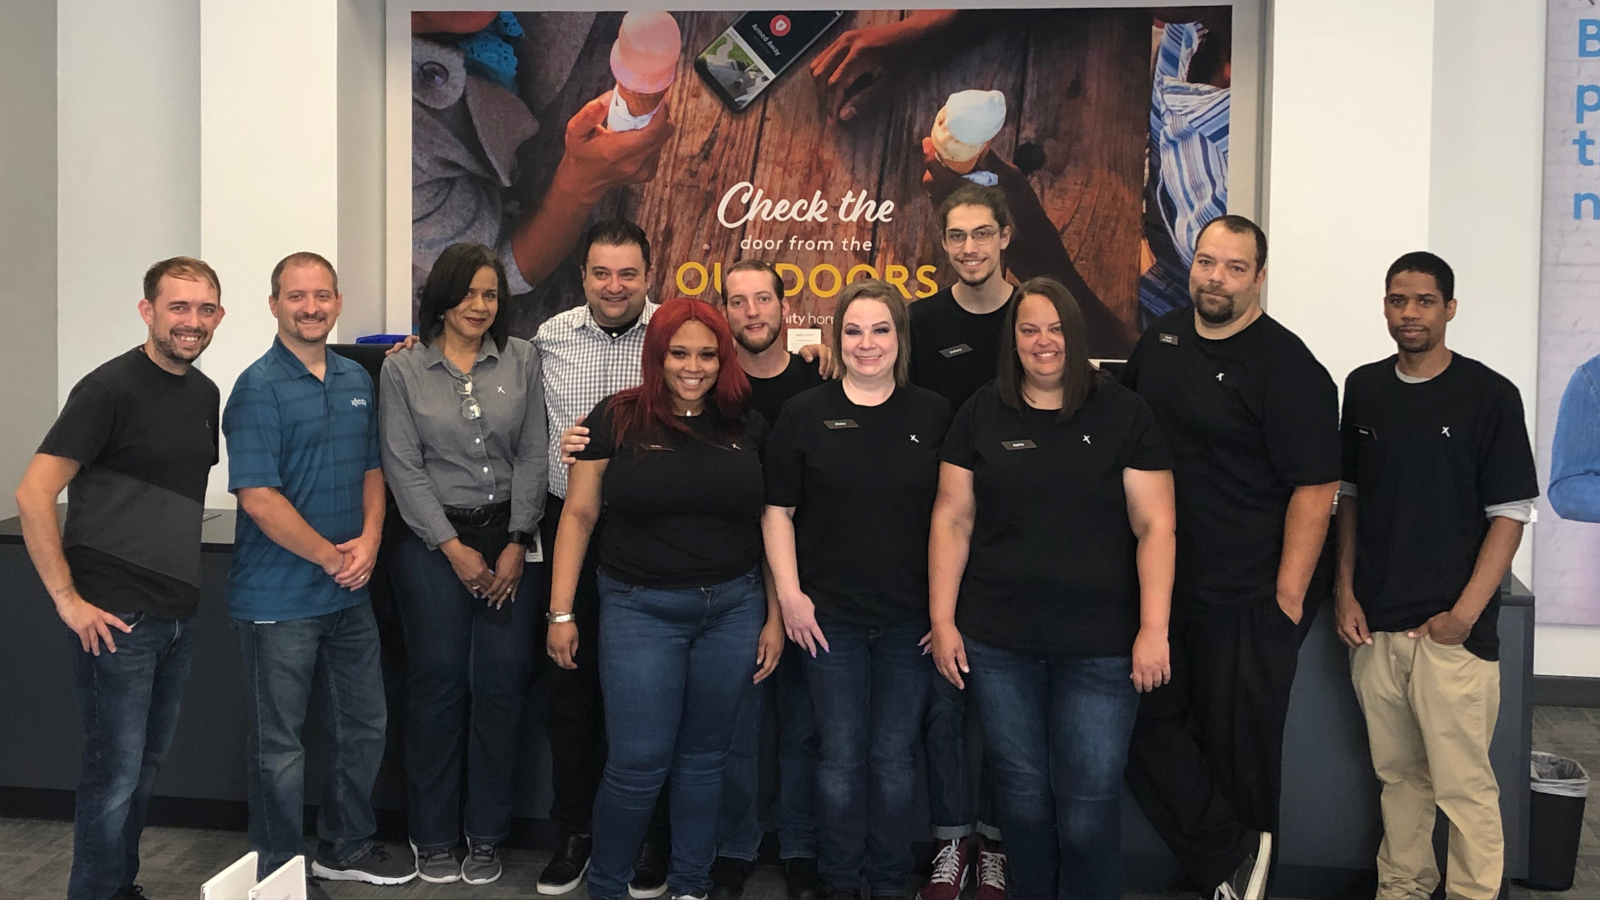 Employees of the Xfinity Store in Bridgeville.